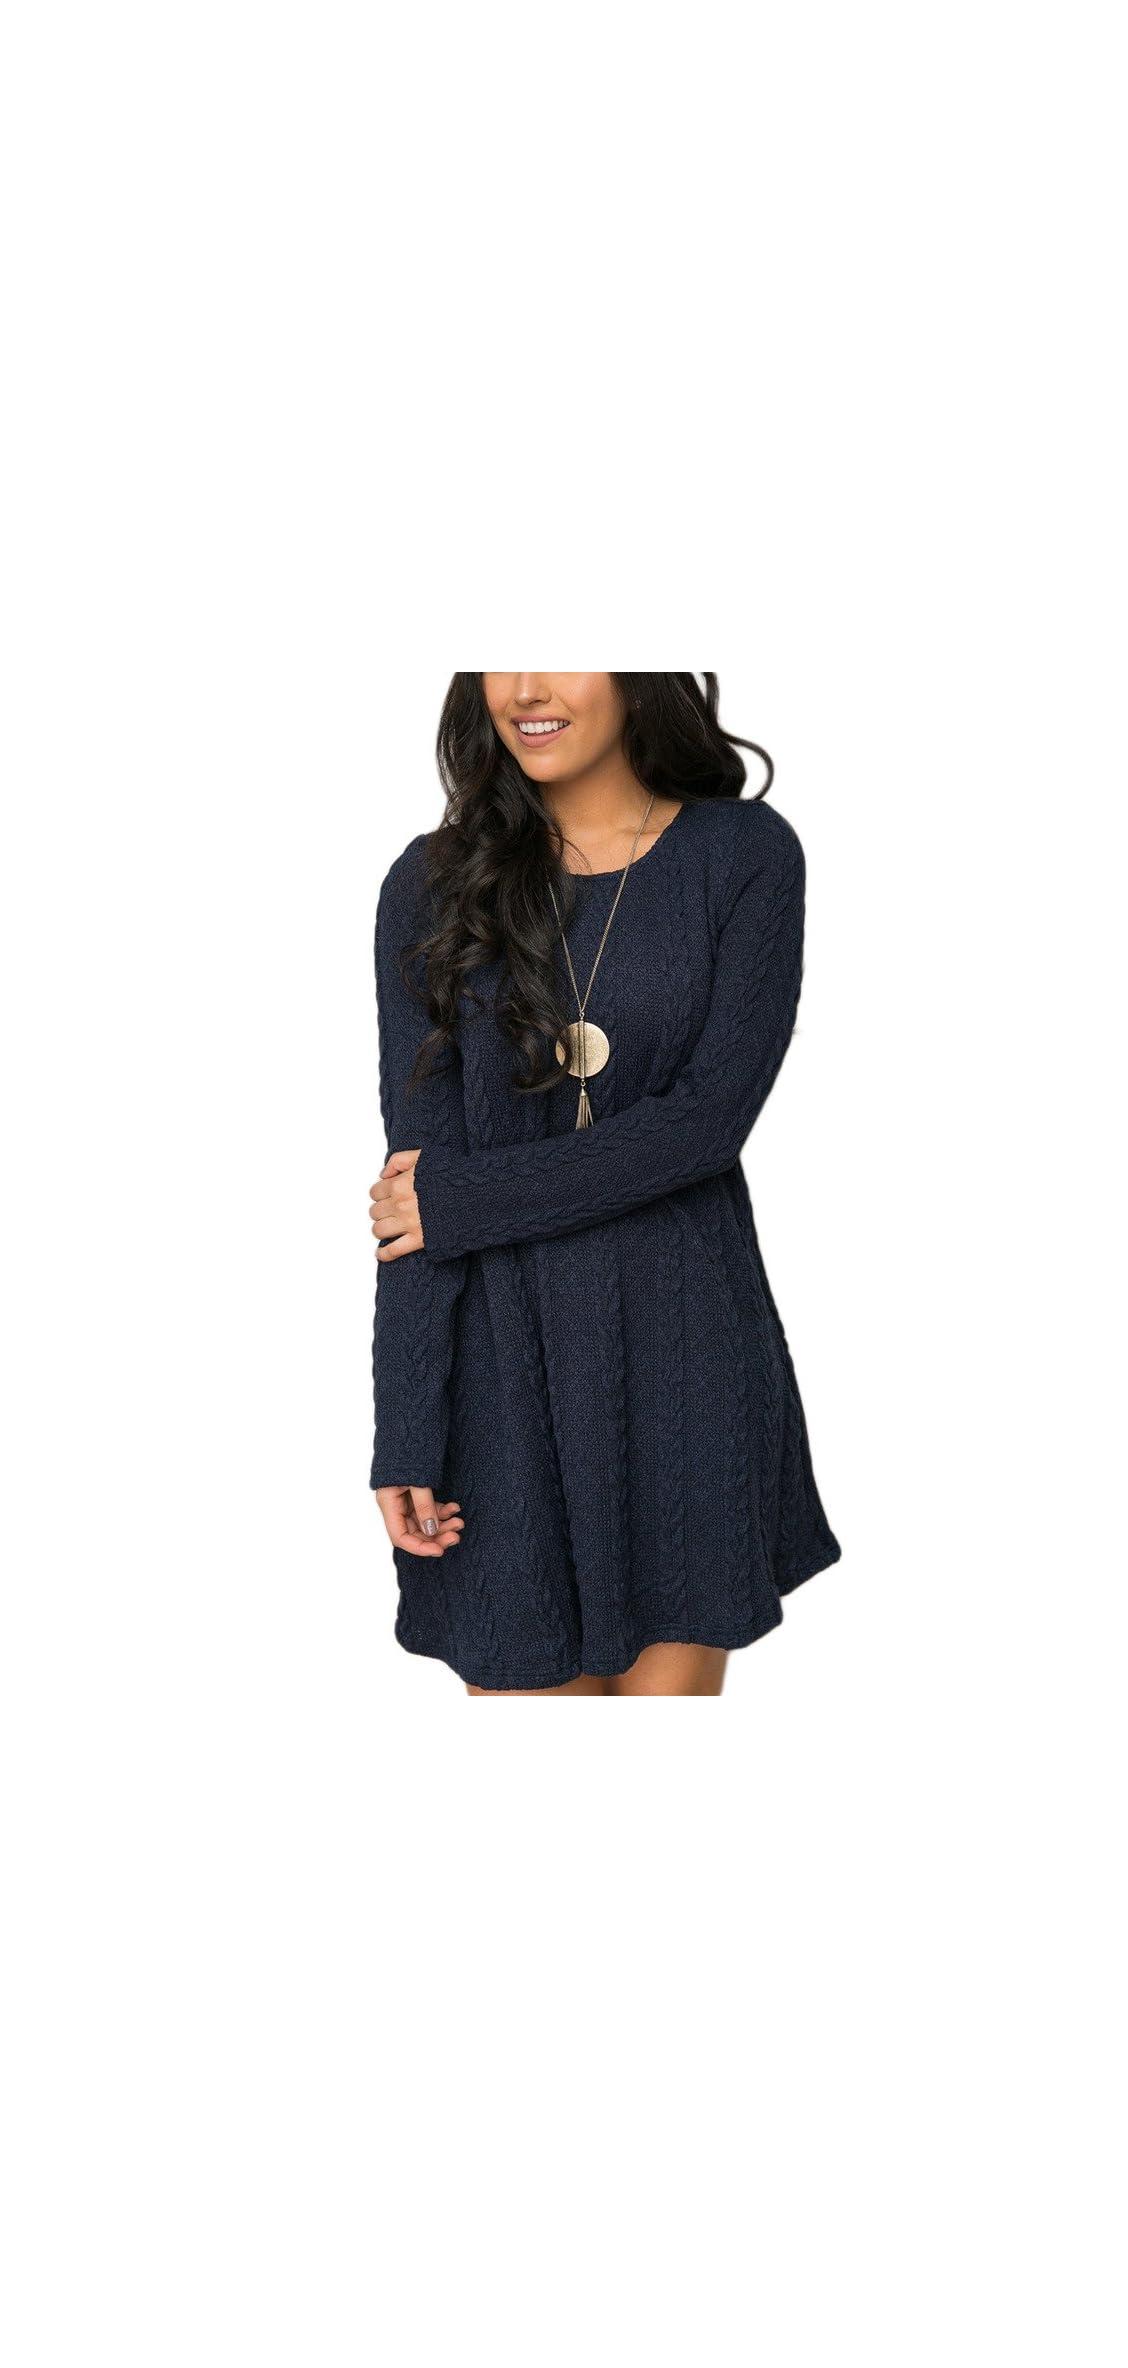 Womens Knitted Crewneck Sweater Dress